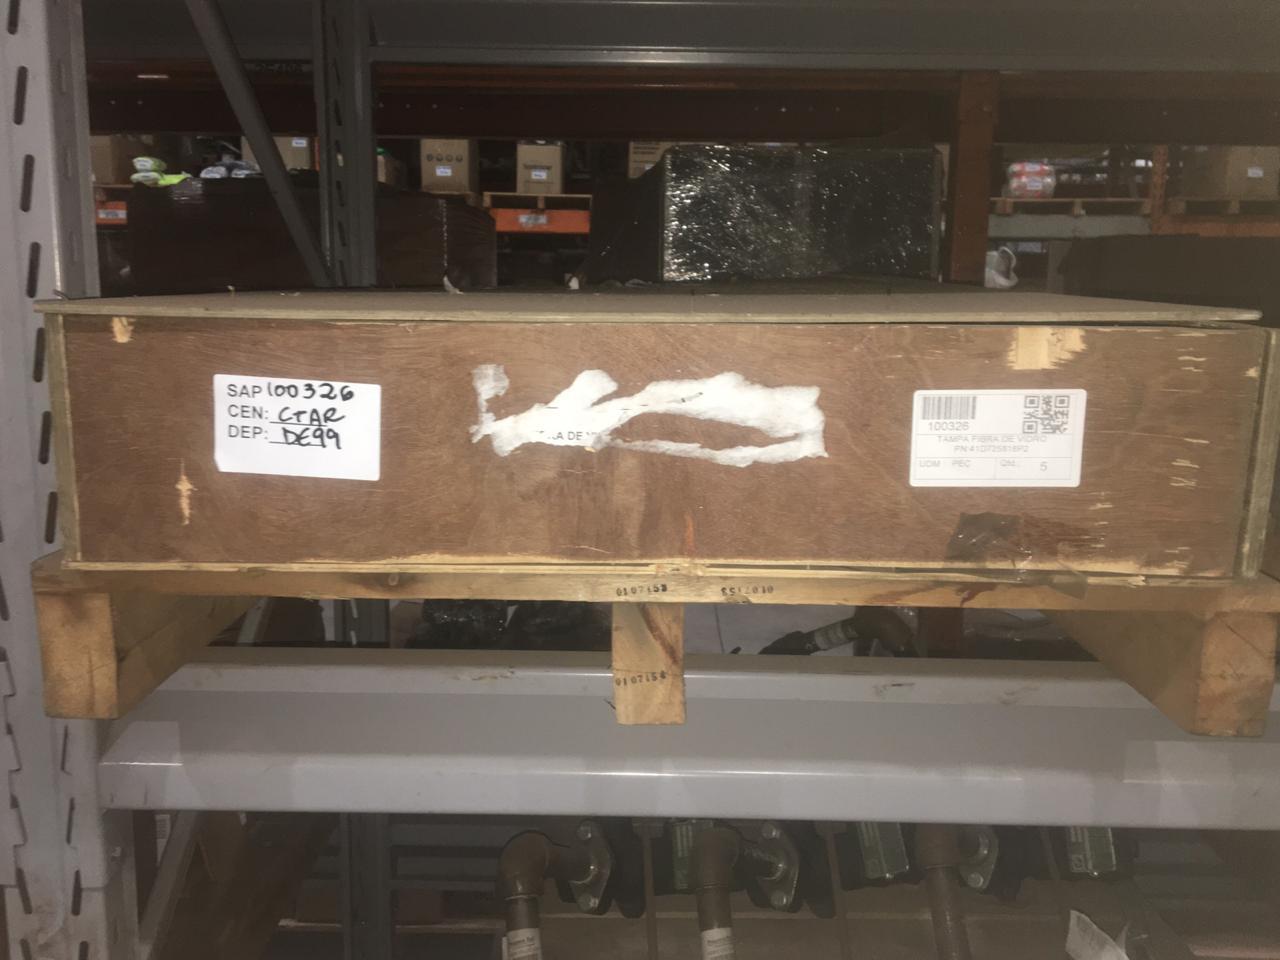 Tampa fibra de vidro pn:41d725818p2 aprox. 5 peças